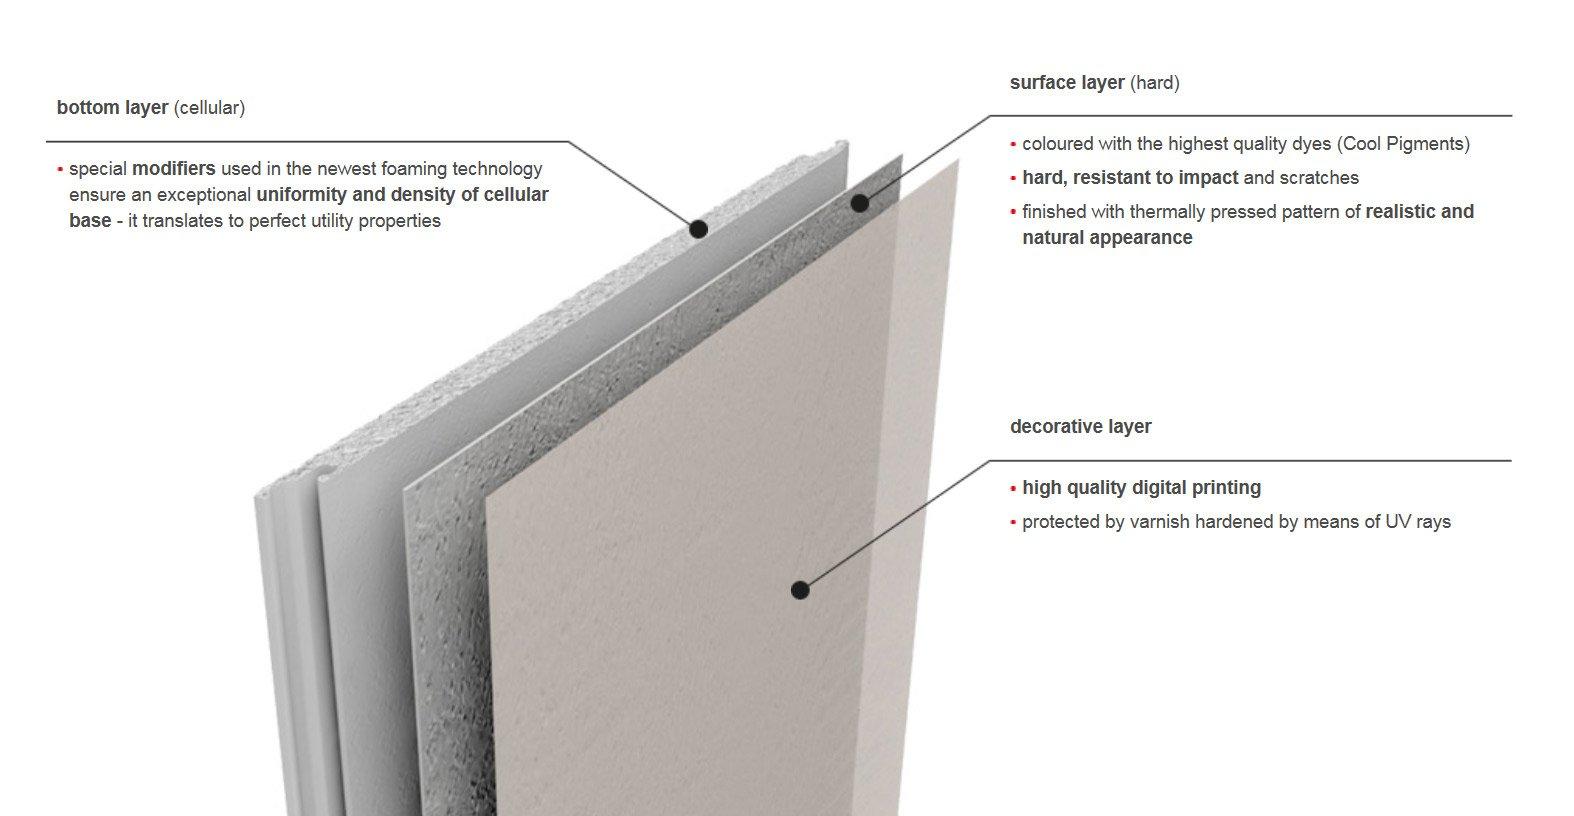 VOX Kerradeco internal cladding panels